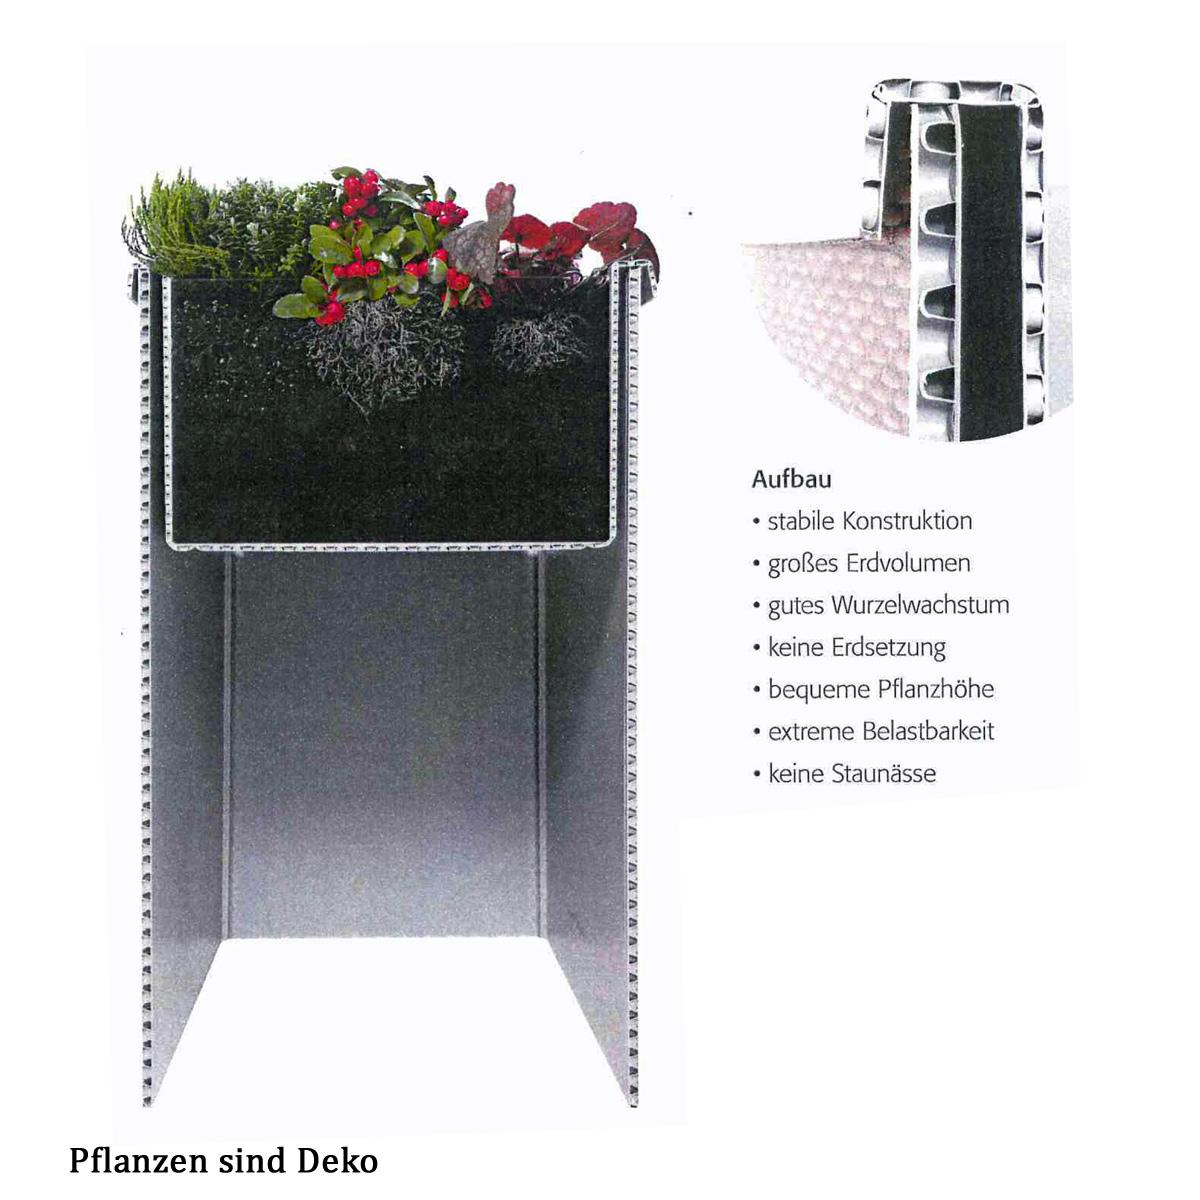 JUWEL Falt-Hochbeet Terrasse Balkon Easy Garden Auswahl, Falthochbeet, Balkonbegrünung, Terrassenbegrünung, Urban Gardening, Rattan-Look, Birke-Look, , var-juwel-falthochbeet-easy-garden